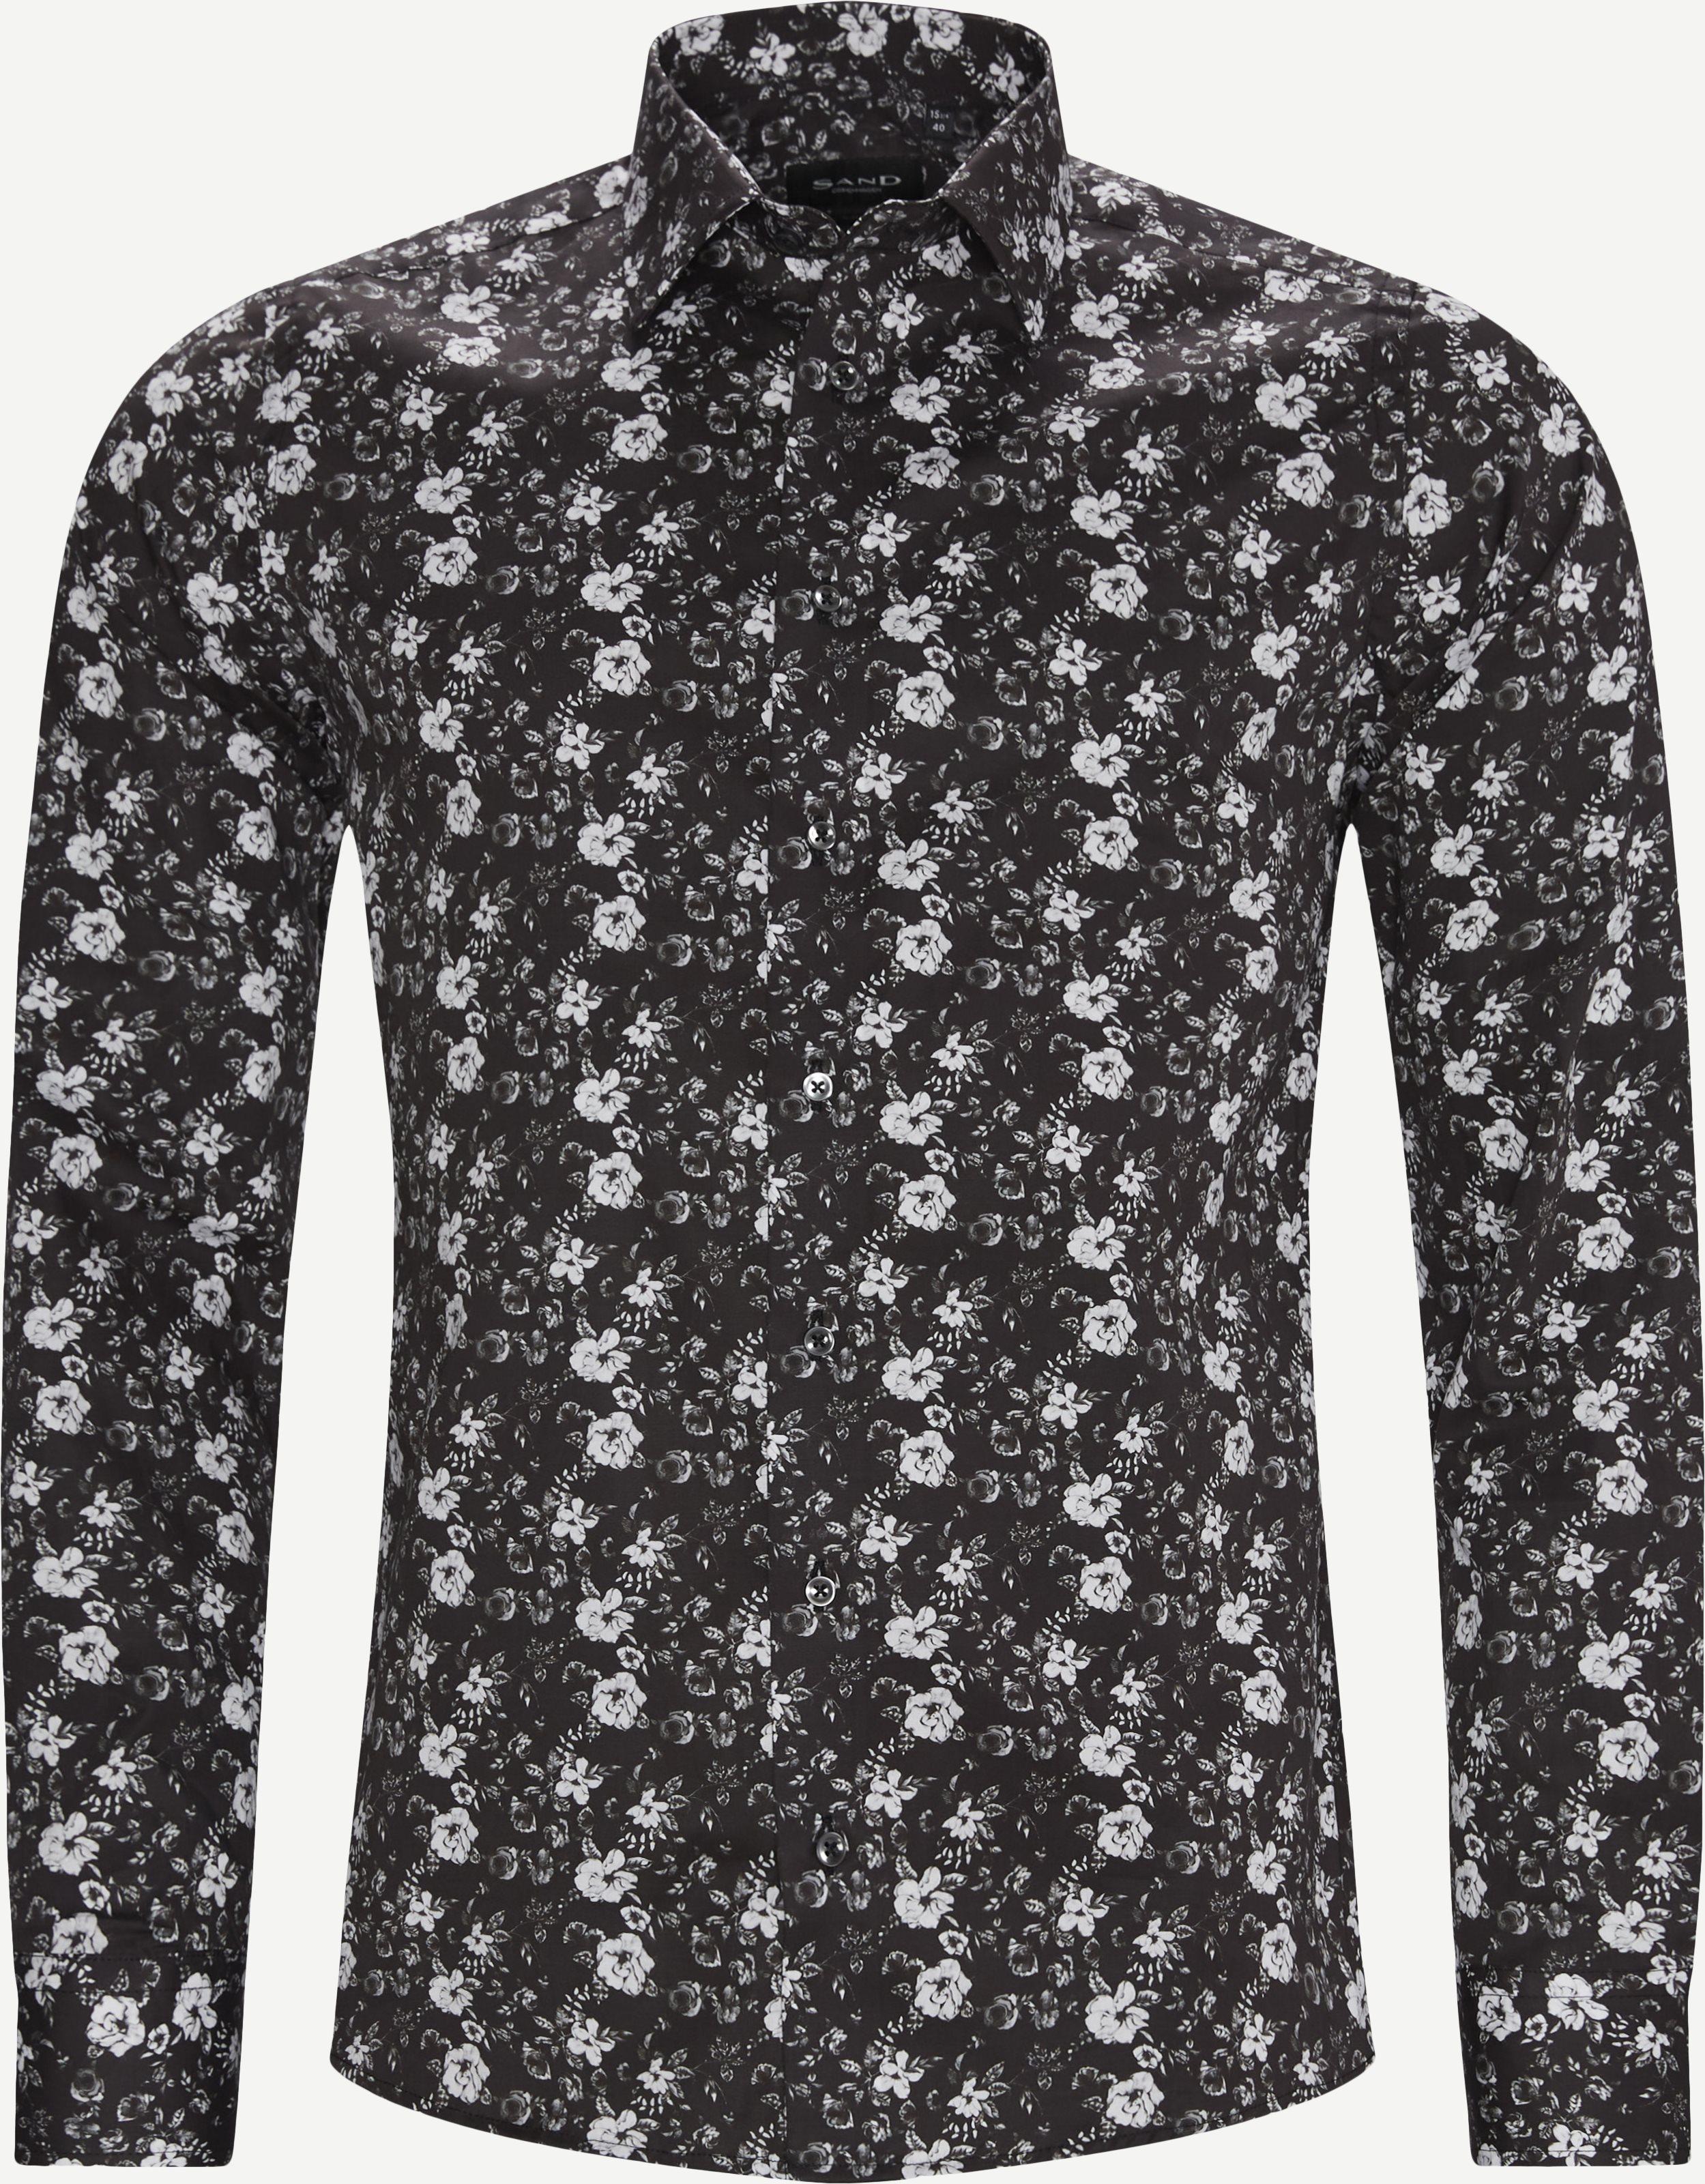 8755 Iver State2/State Shirt - Skjorter - Sort